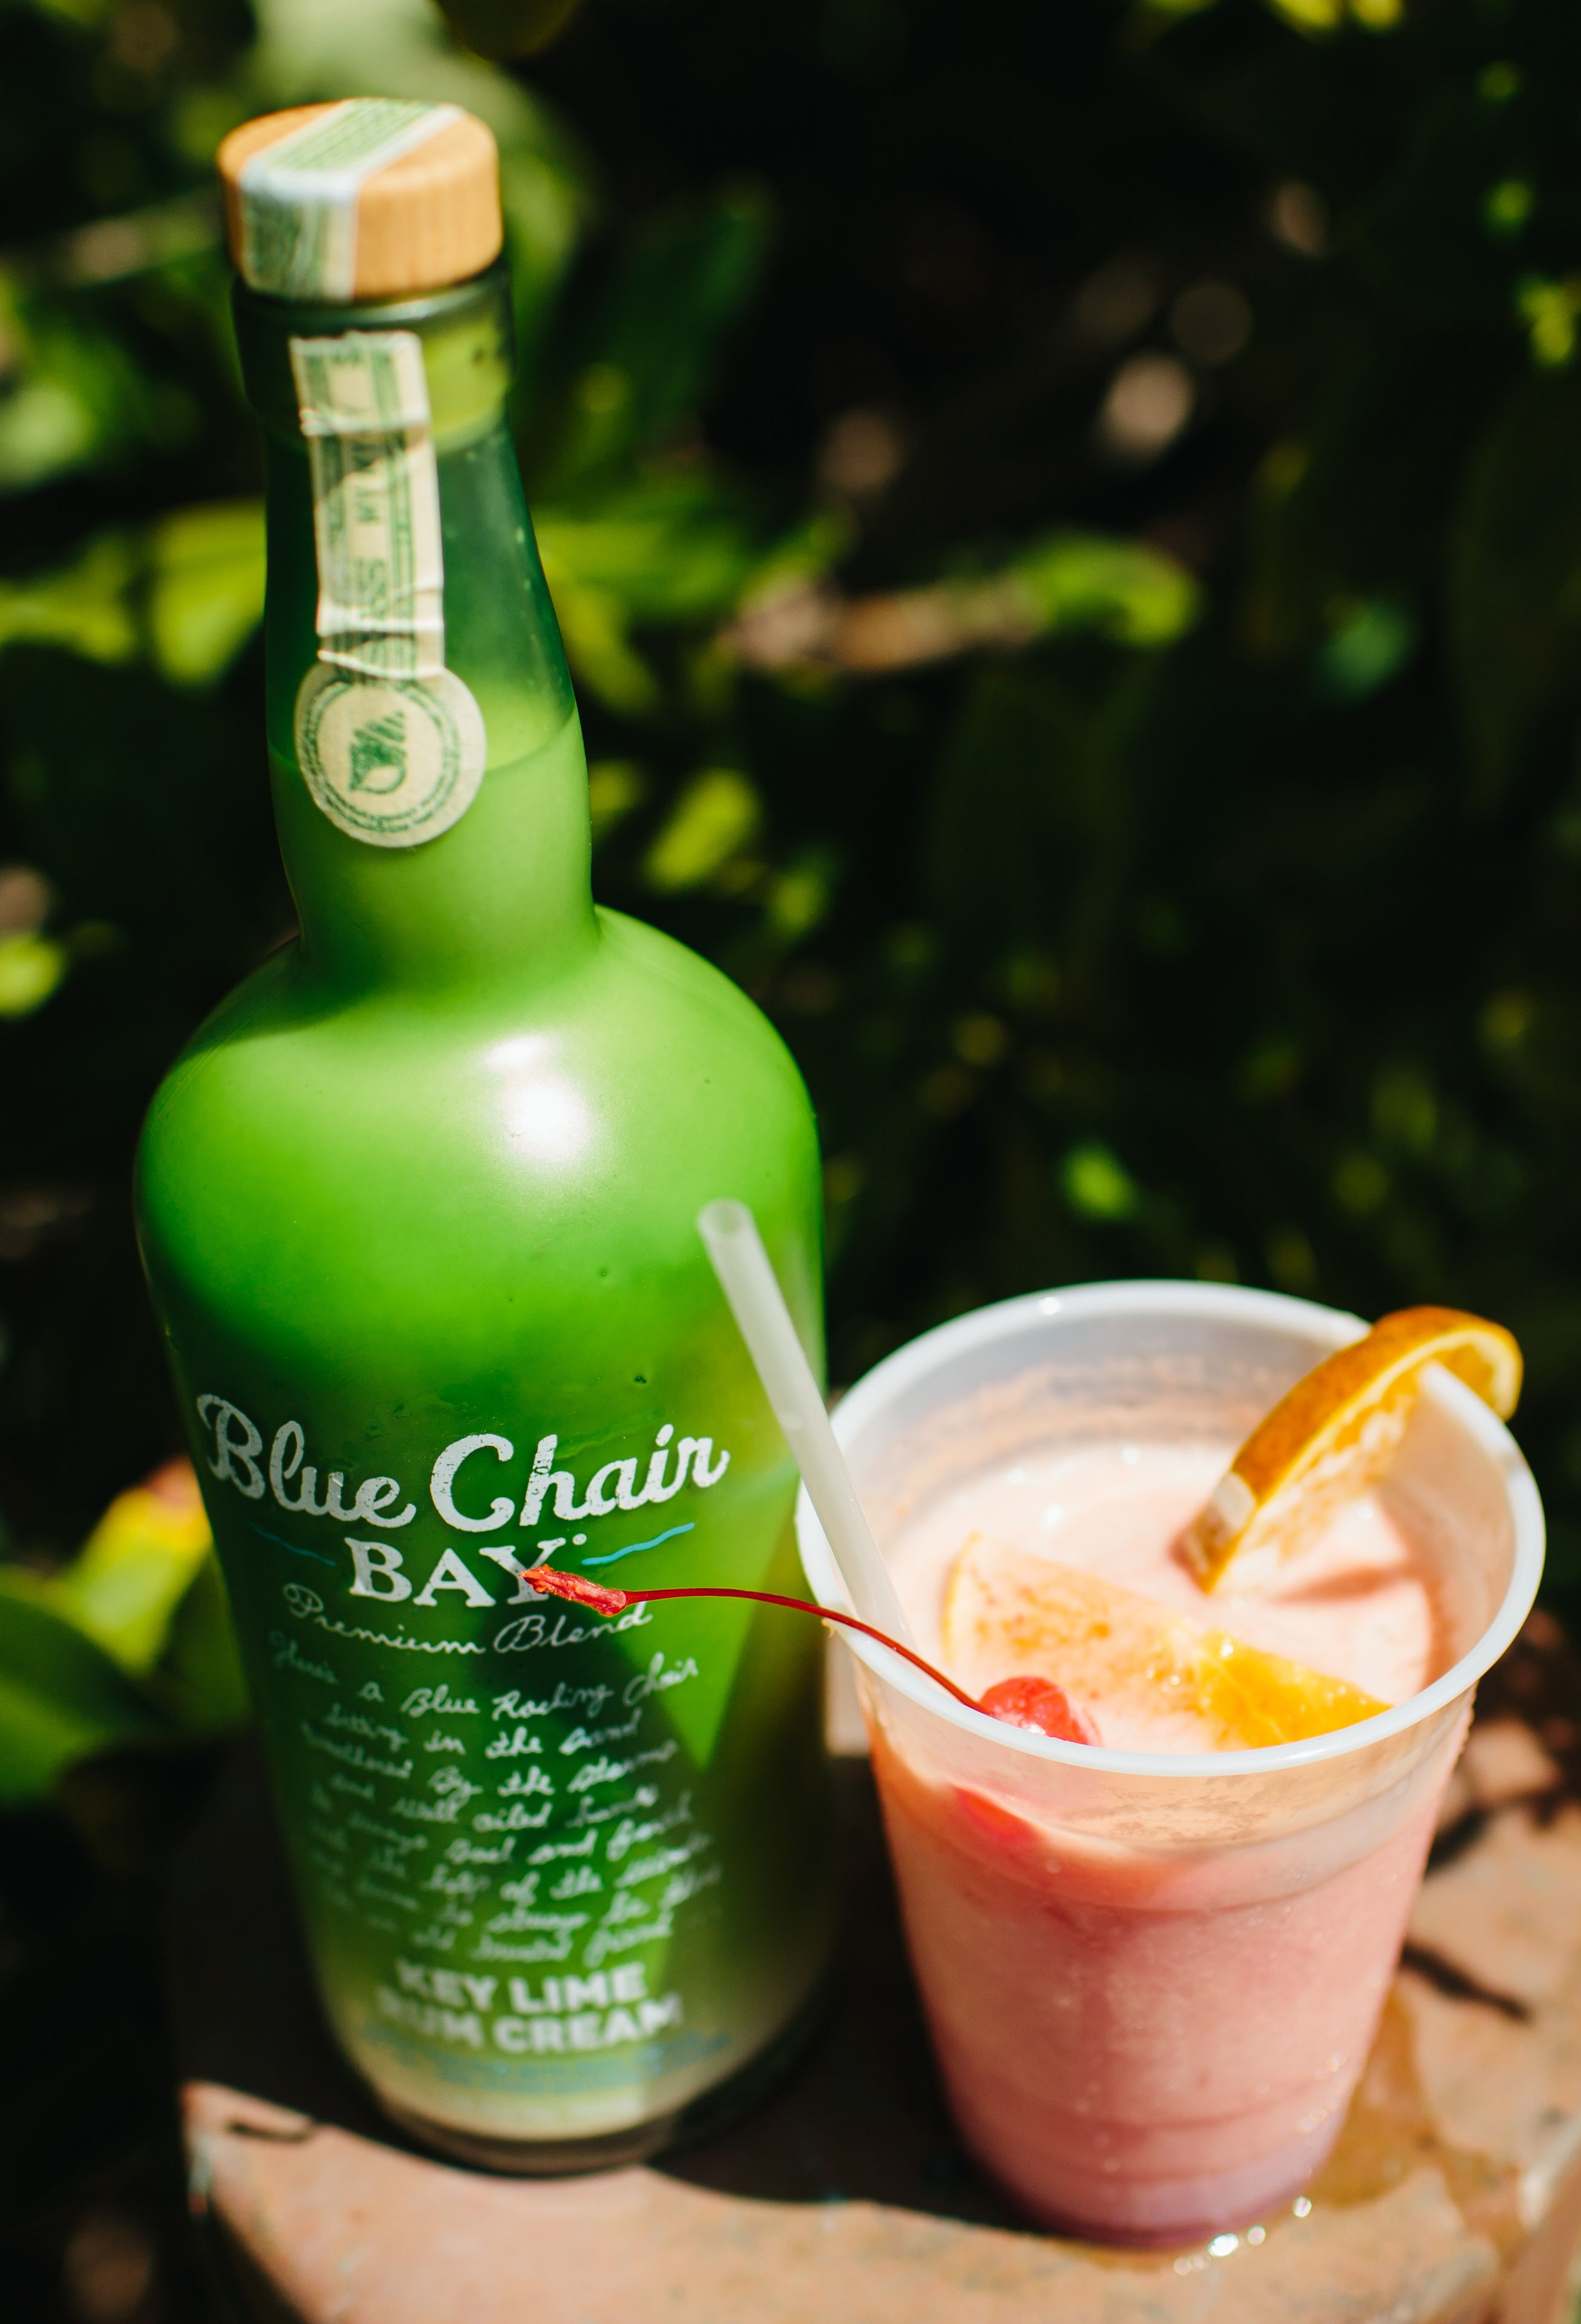 Cherry On Top Blue Chair Bay Key Lime Rum Cream